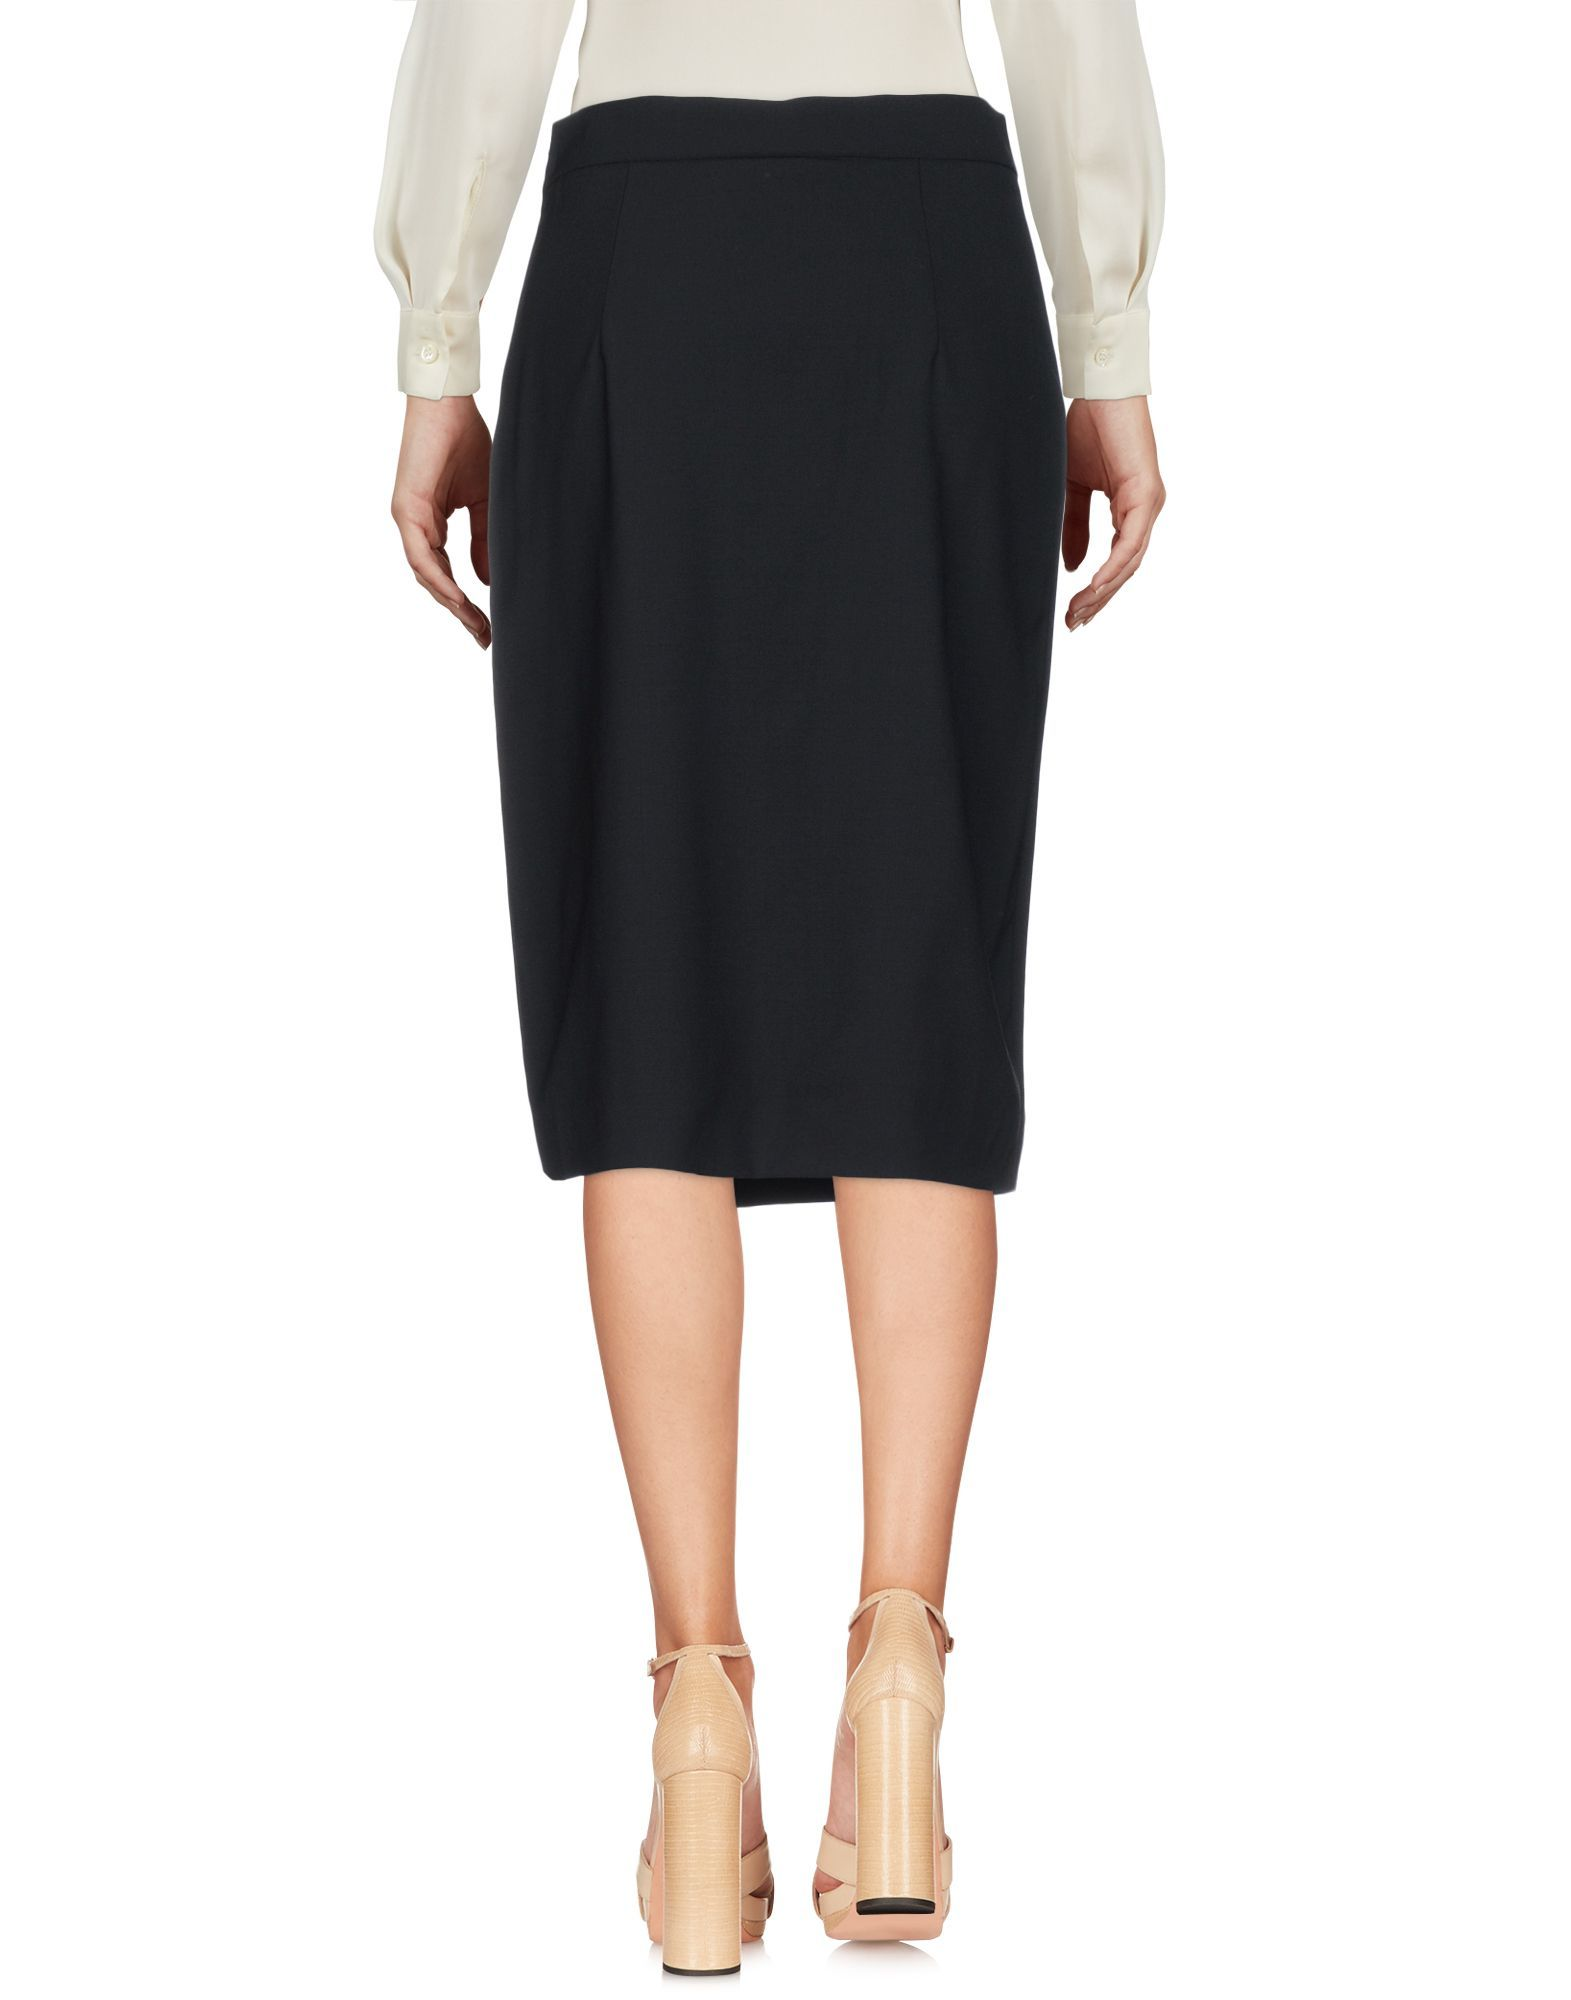 DKNY Black Wool Knee Length Skirt